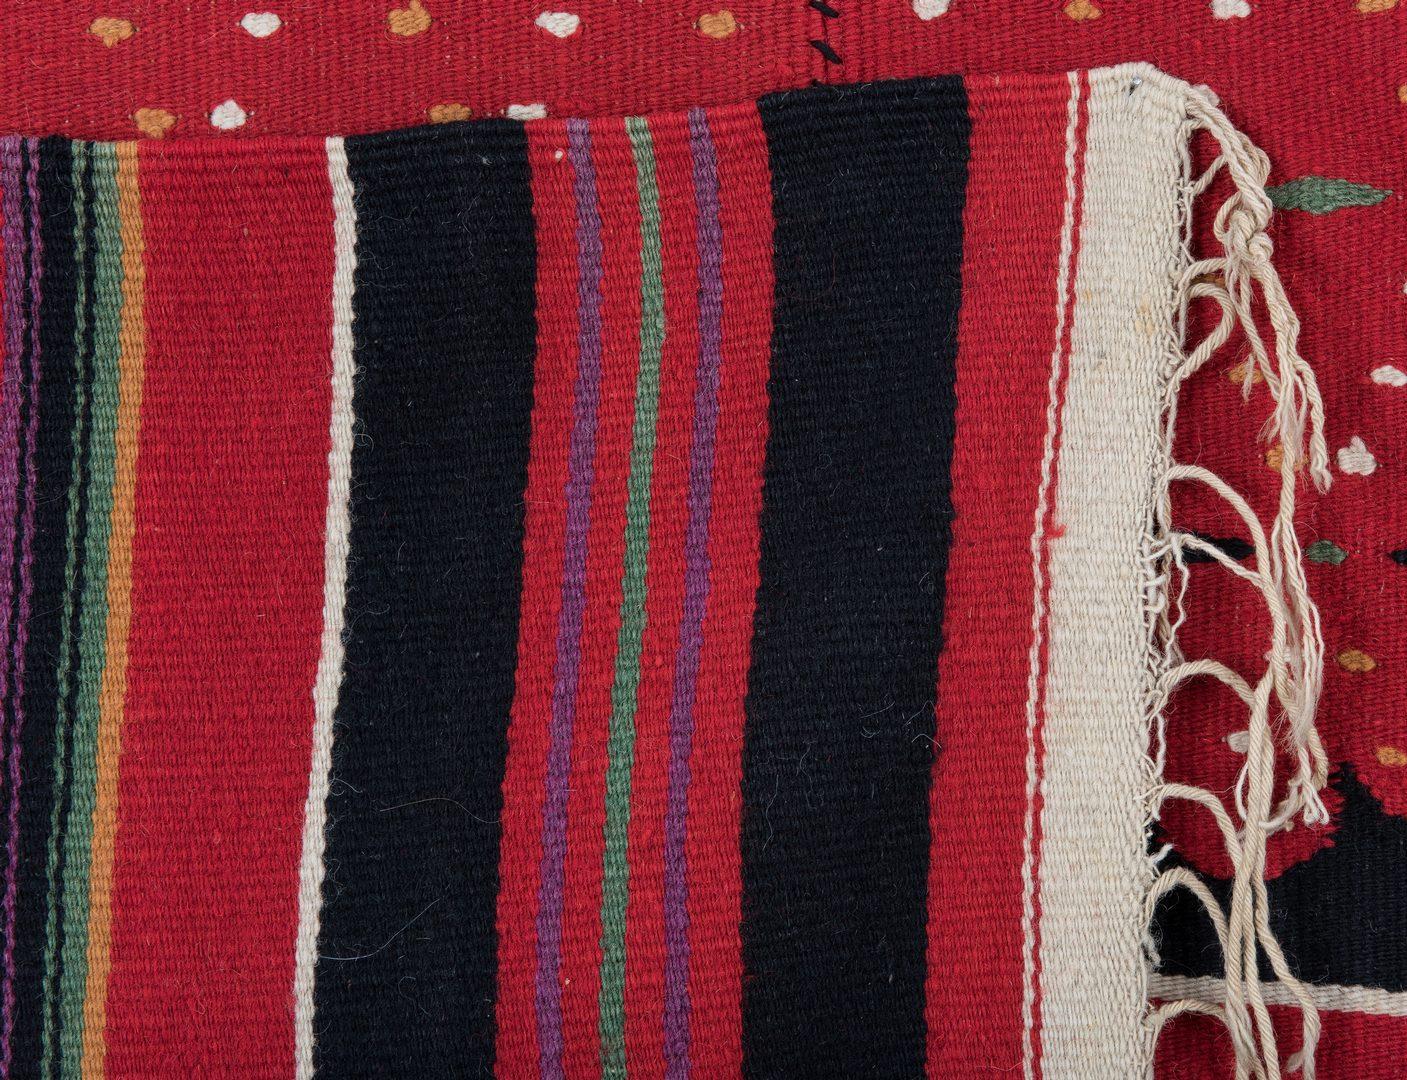 Lot 666: Vintage Red Mexican Saltillo Serape Blanket